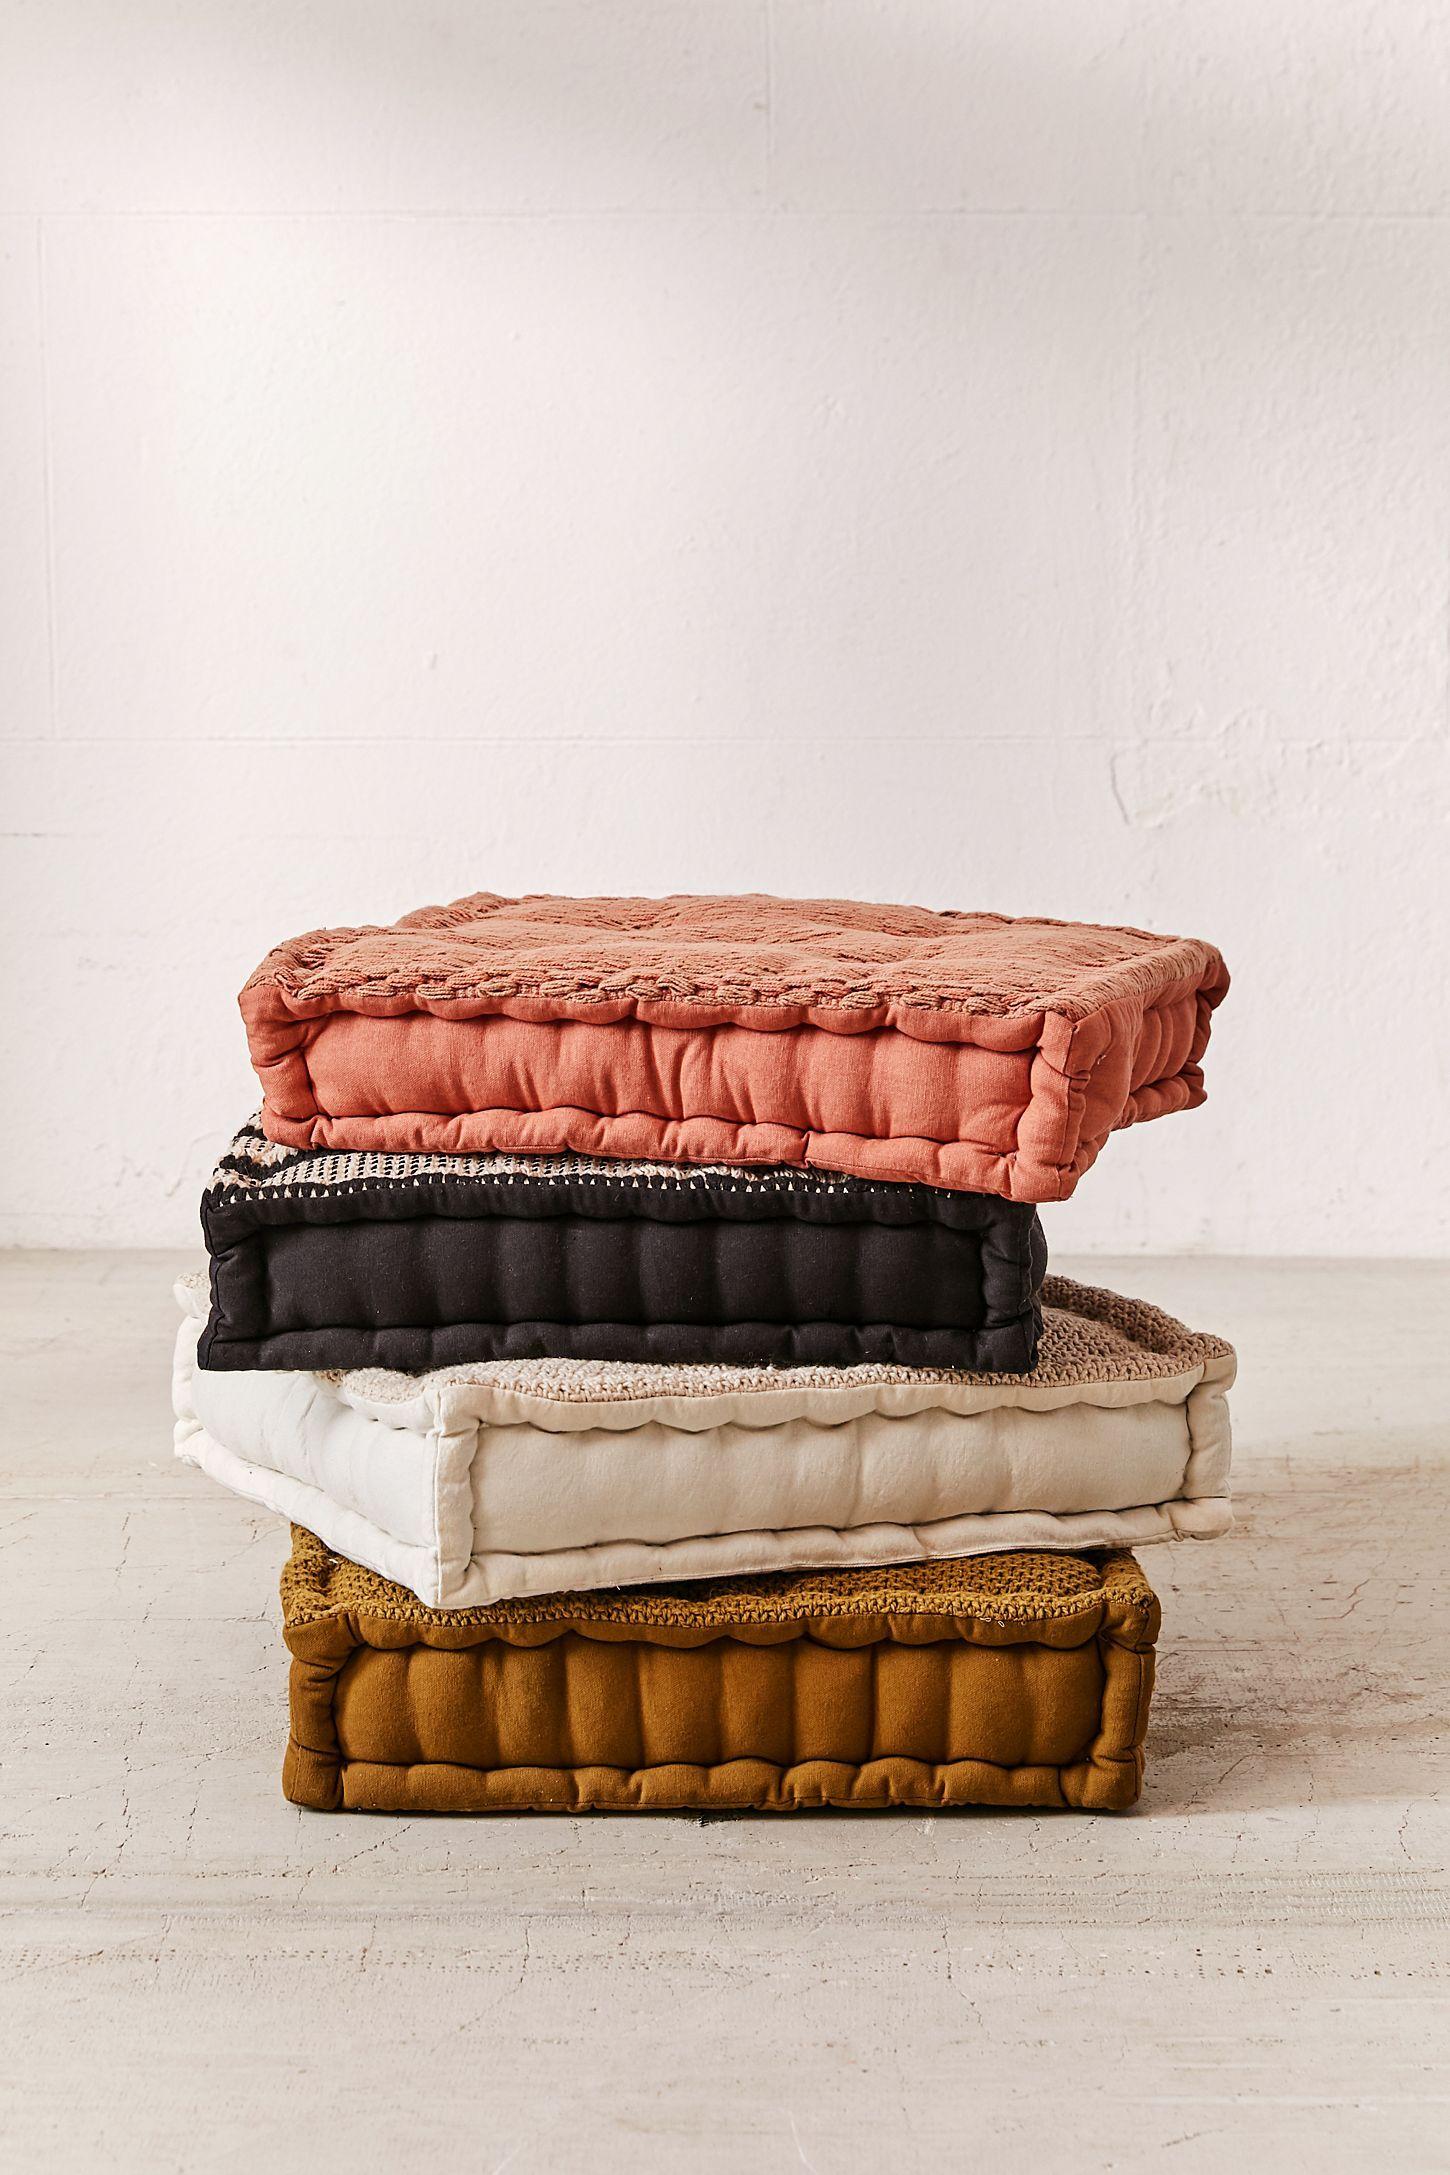 Knit Floor Pillow In 2020 Floor Pillows Boho Floor Pillows Large Floor Pillows